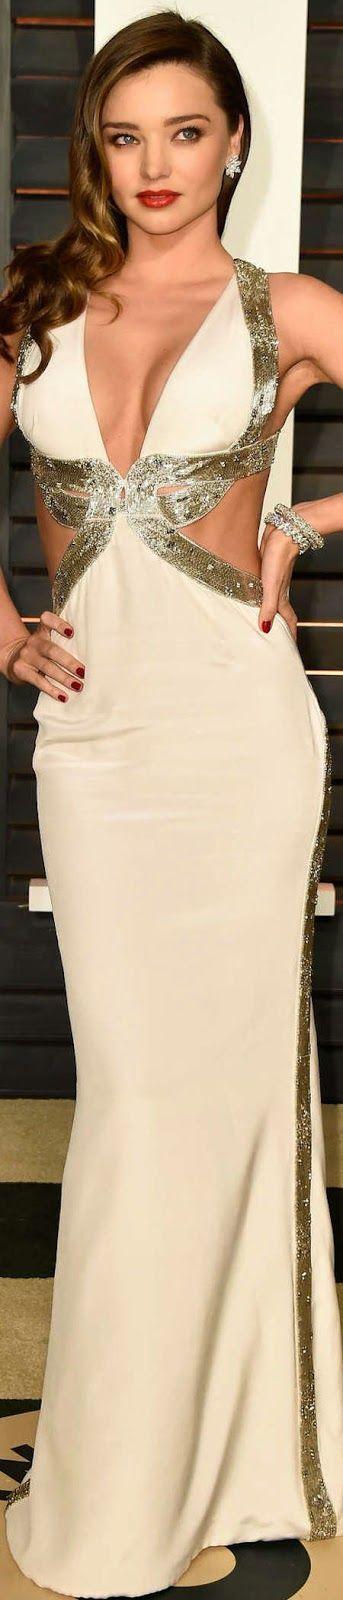 Miranda Kerr 2015 Vanity Fair Oscar Party. White long maxi prom evening dress. #women #fashion outfit #clothing style apparel @roressclothes closet ideas